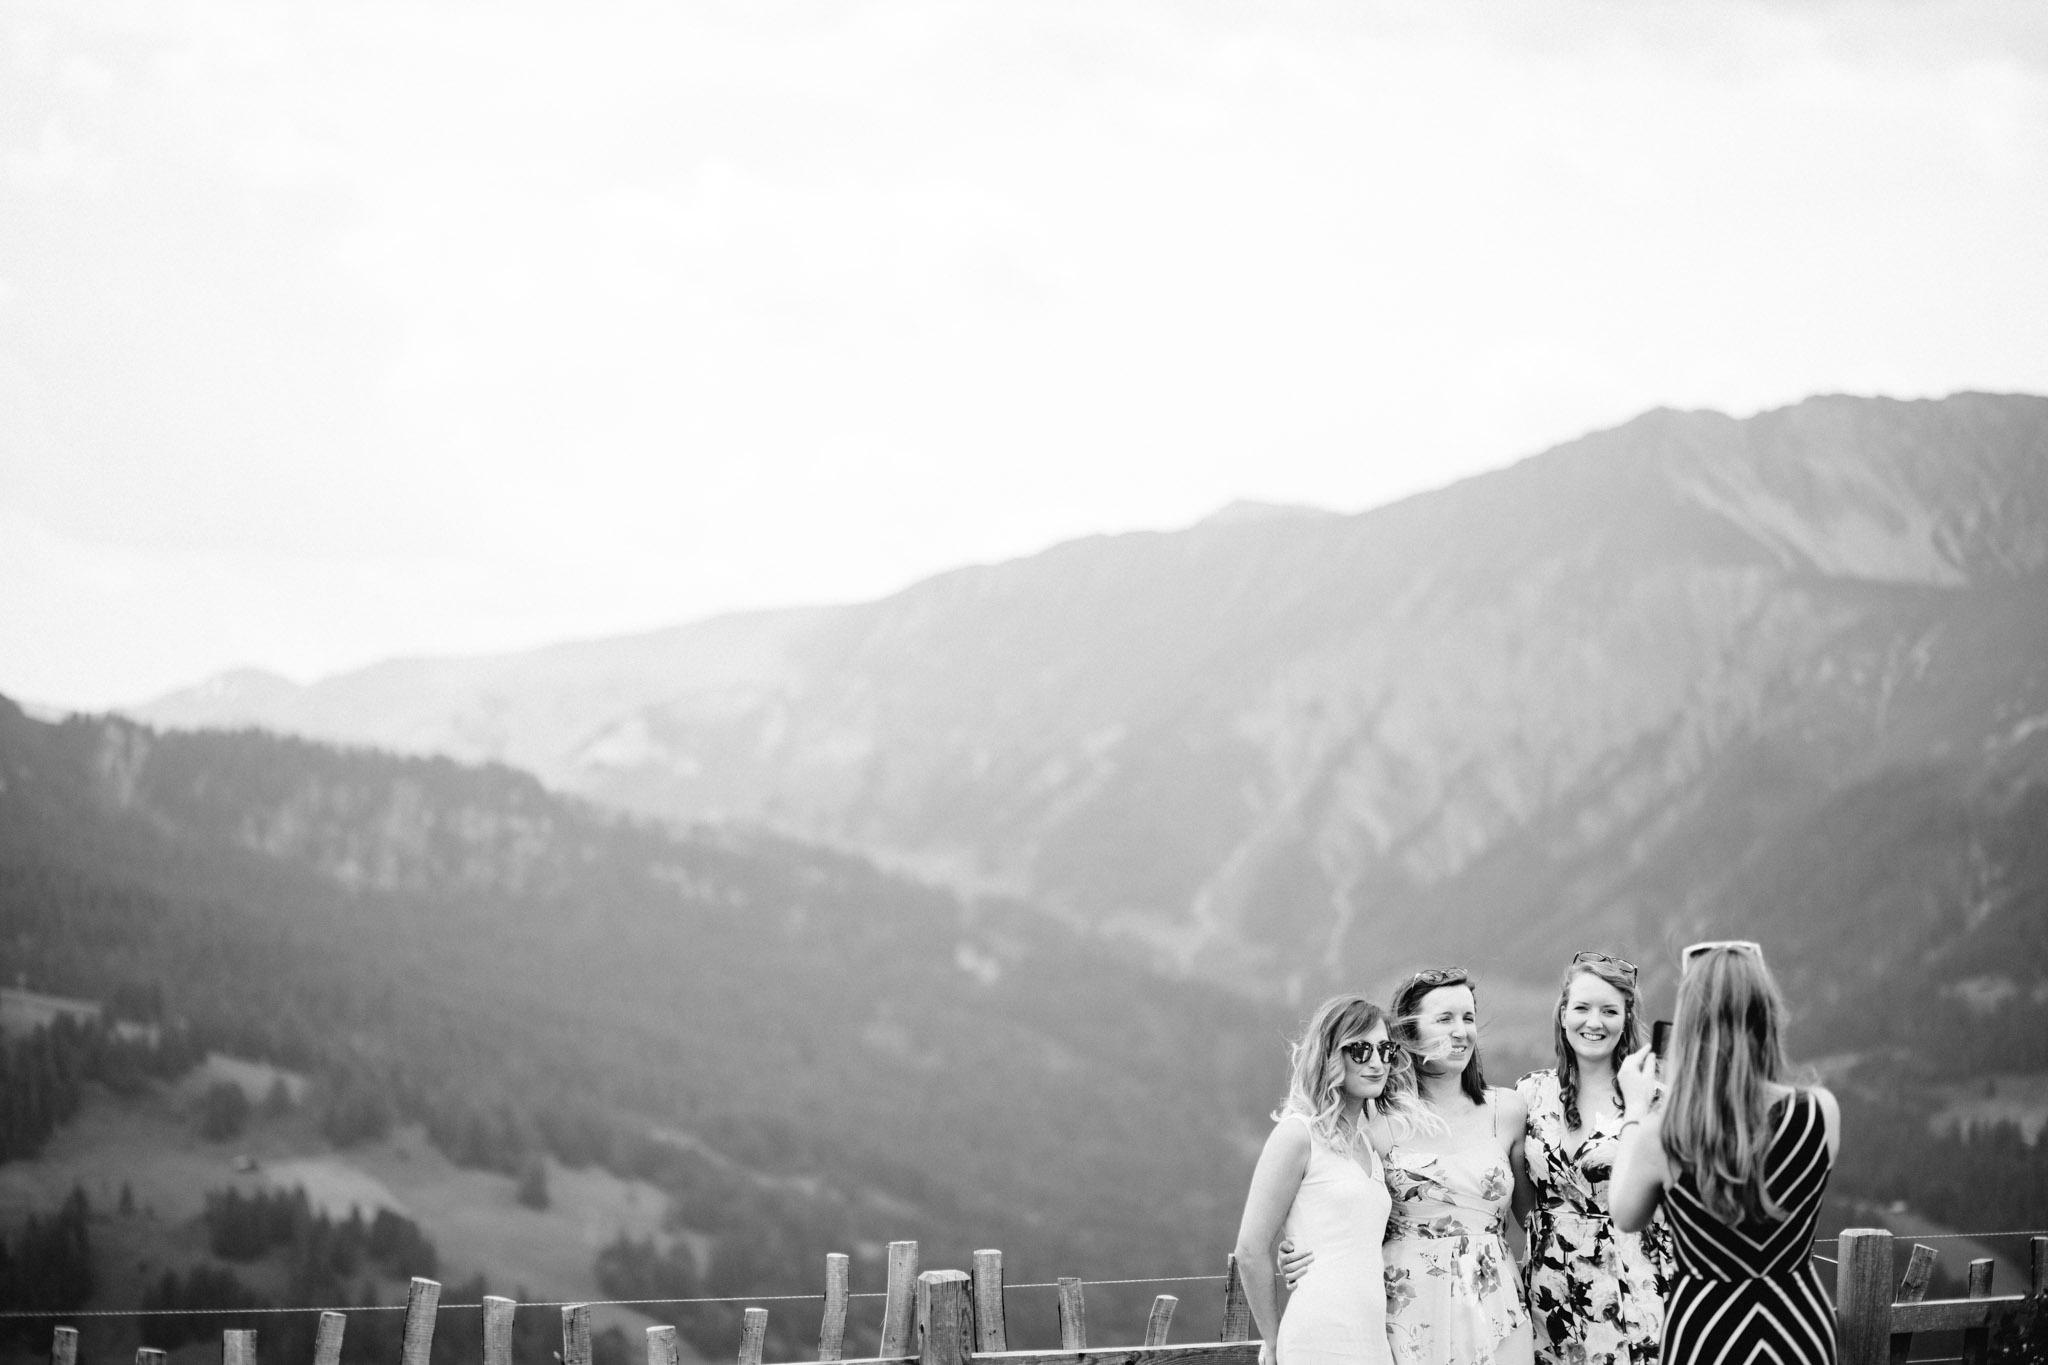 Lenl-Simmental-Buehlerhof-Pia-Anna-Christian-Wedding-Photography-EK-65.jpg